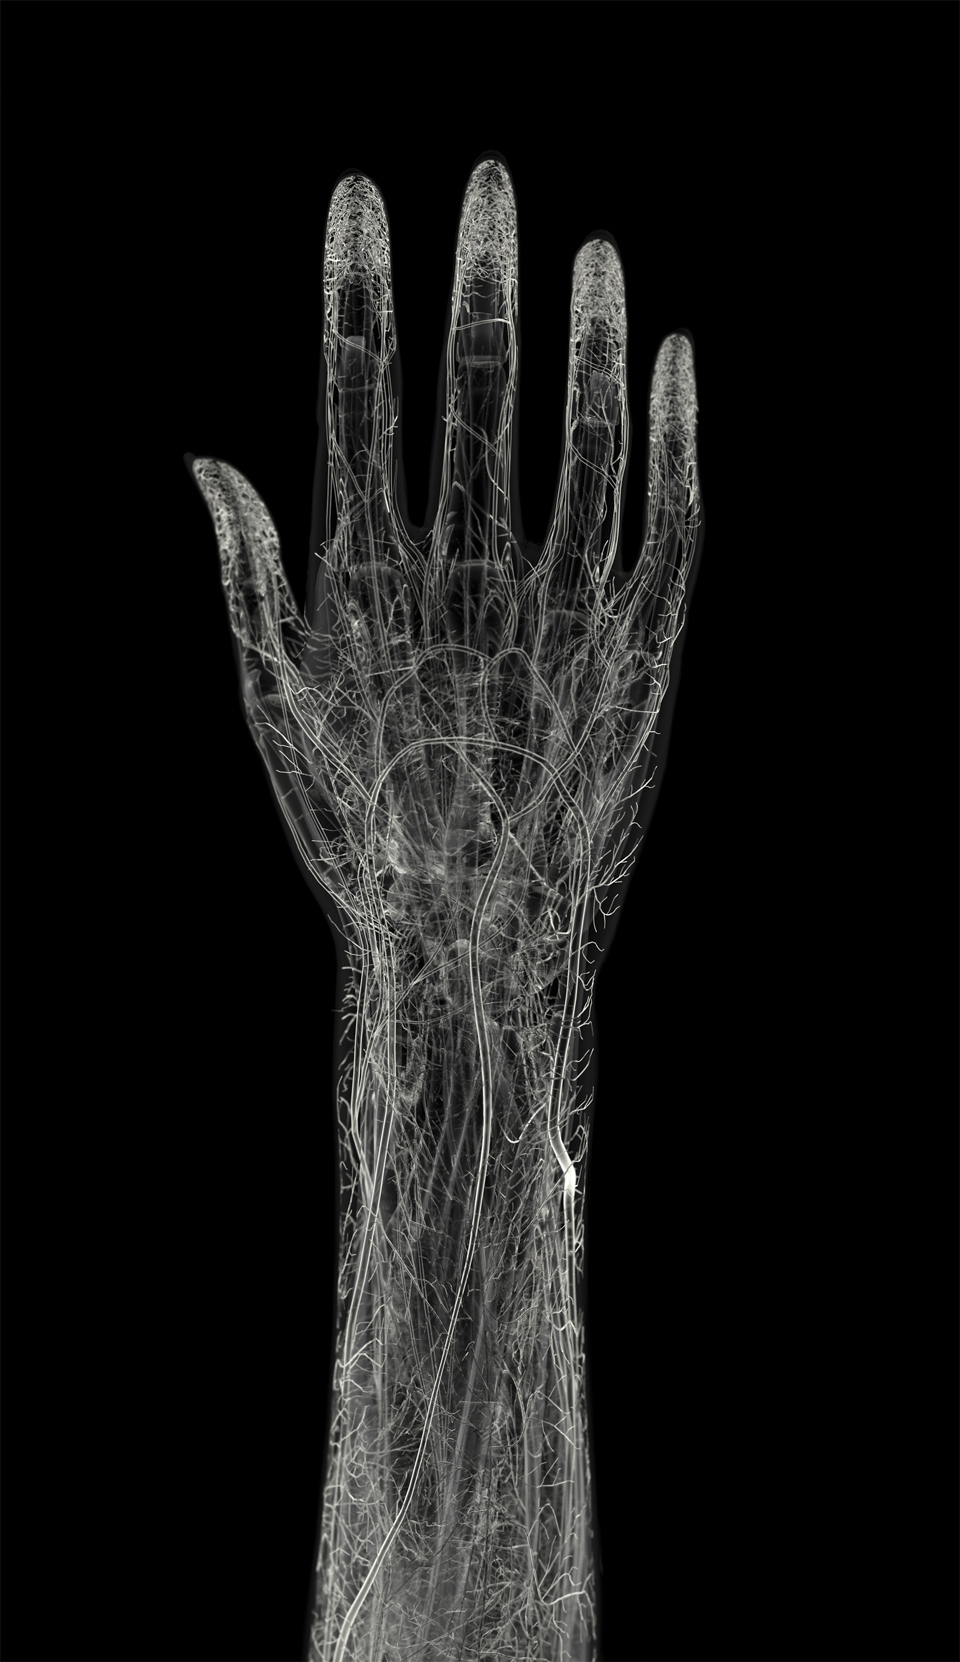 MensHealth_hand_final.jpg